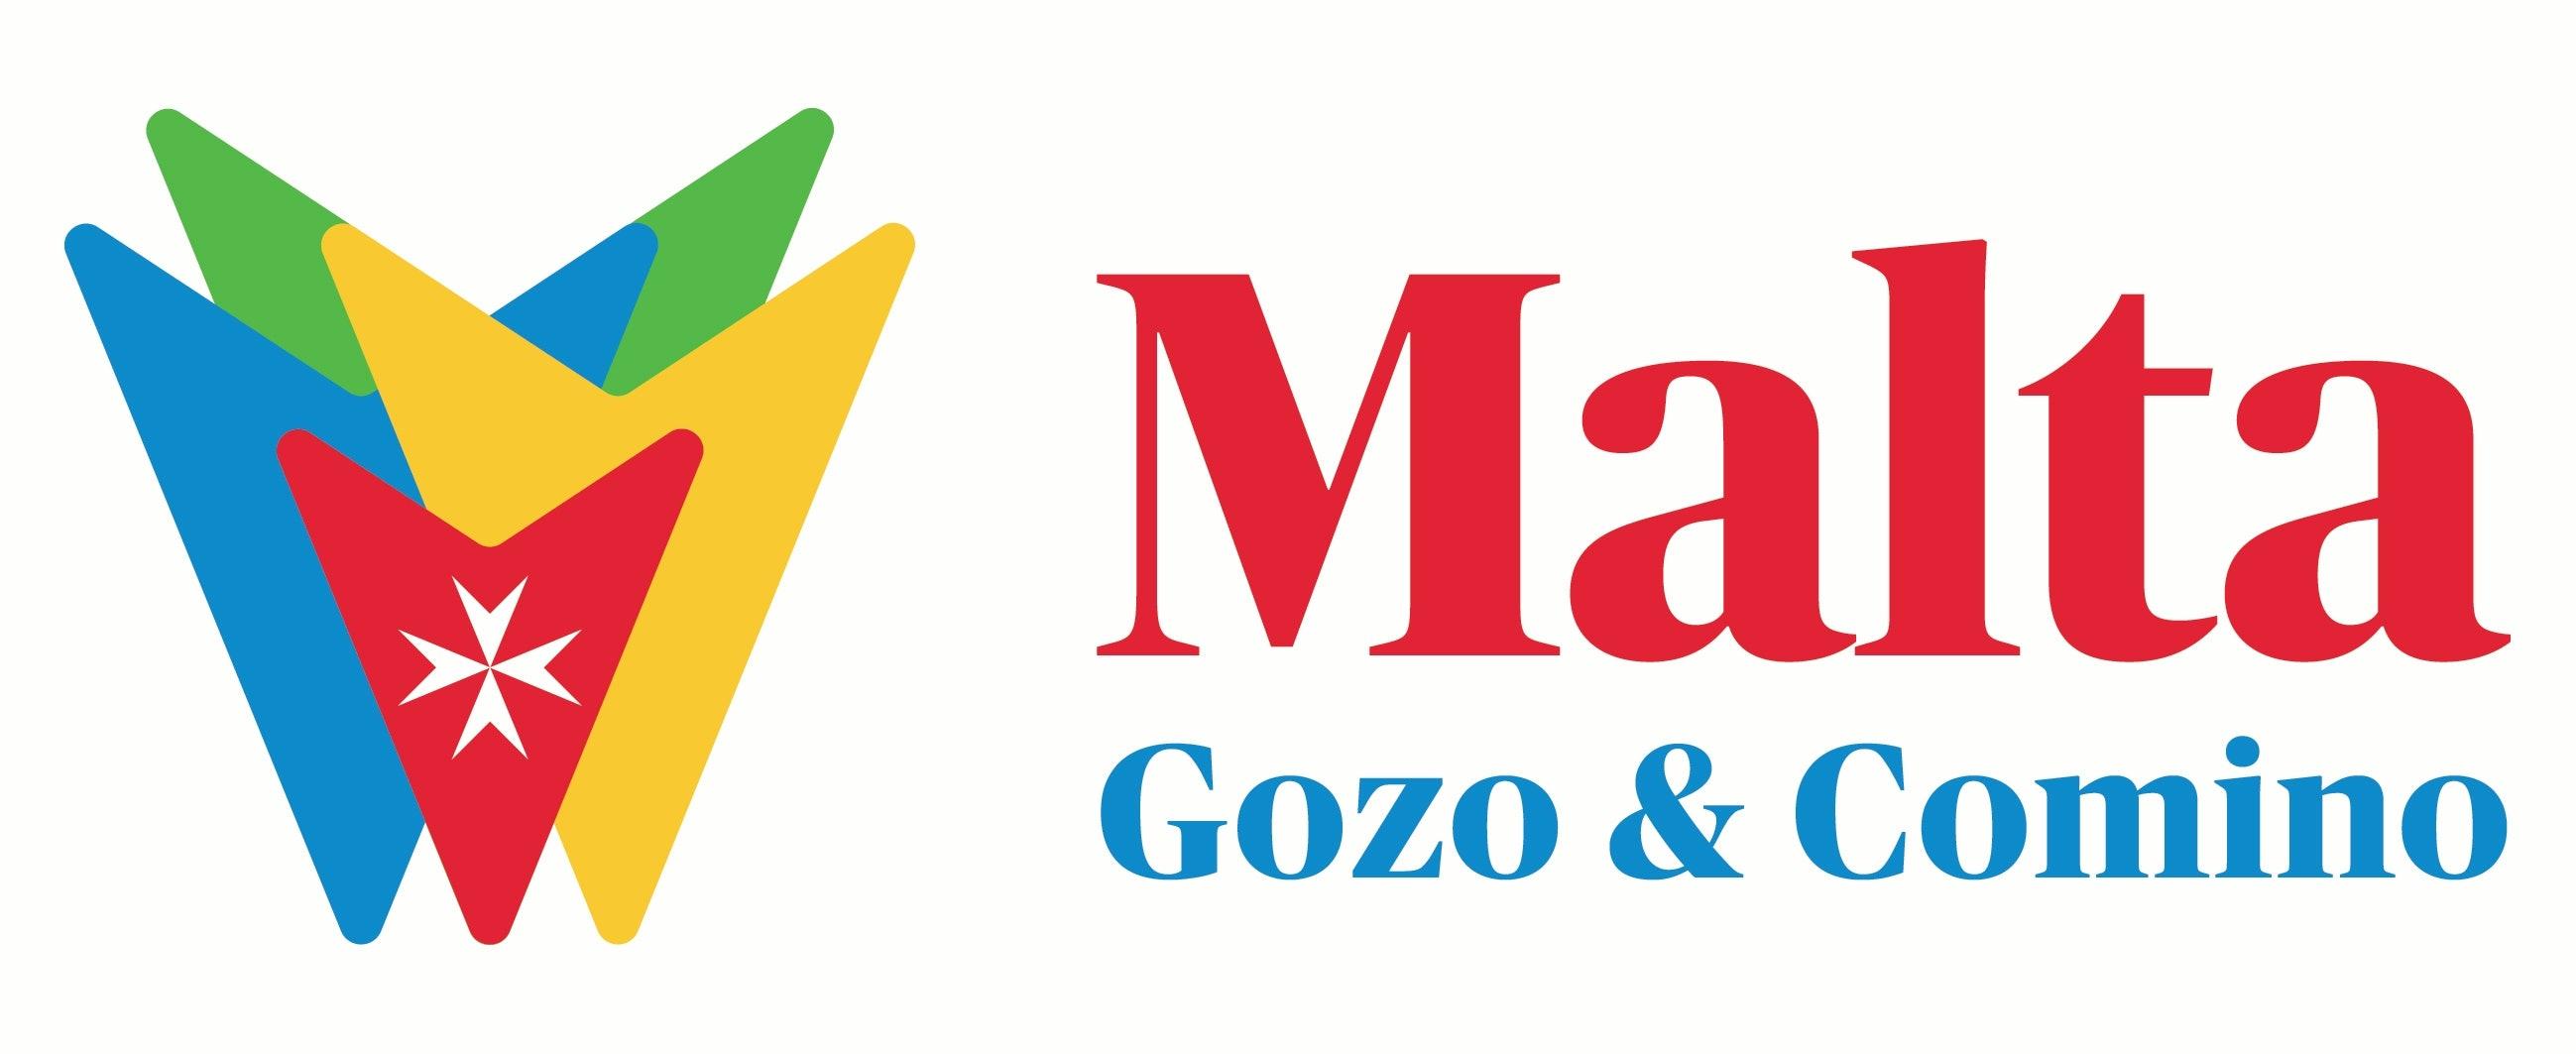 Logo von Malta Gozo und Comino Touristikbüro.